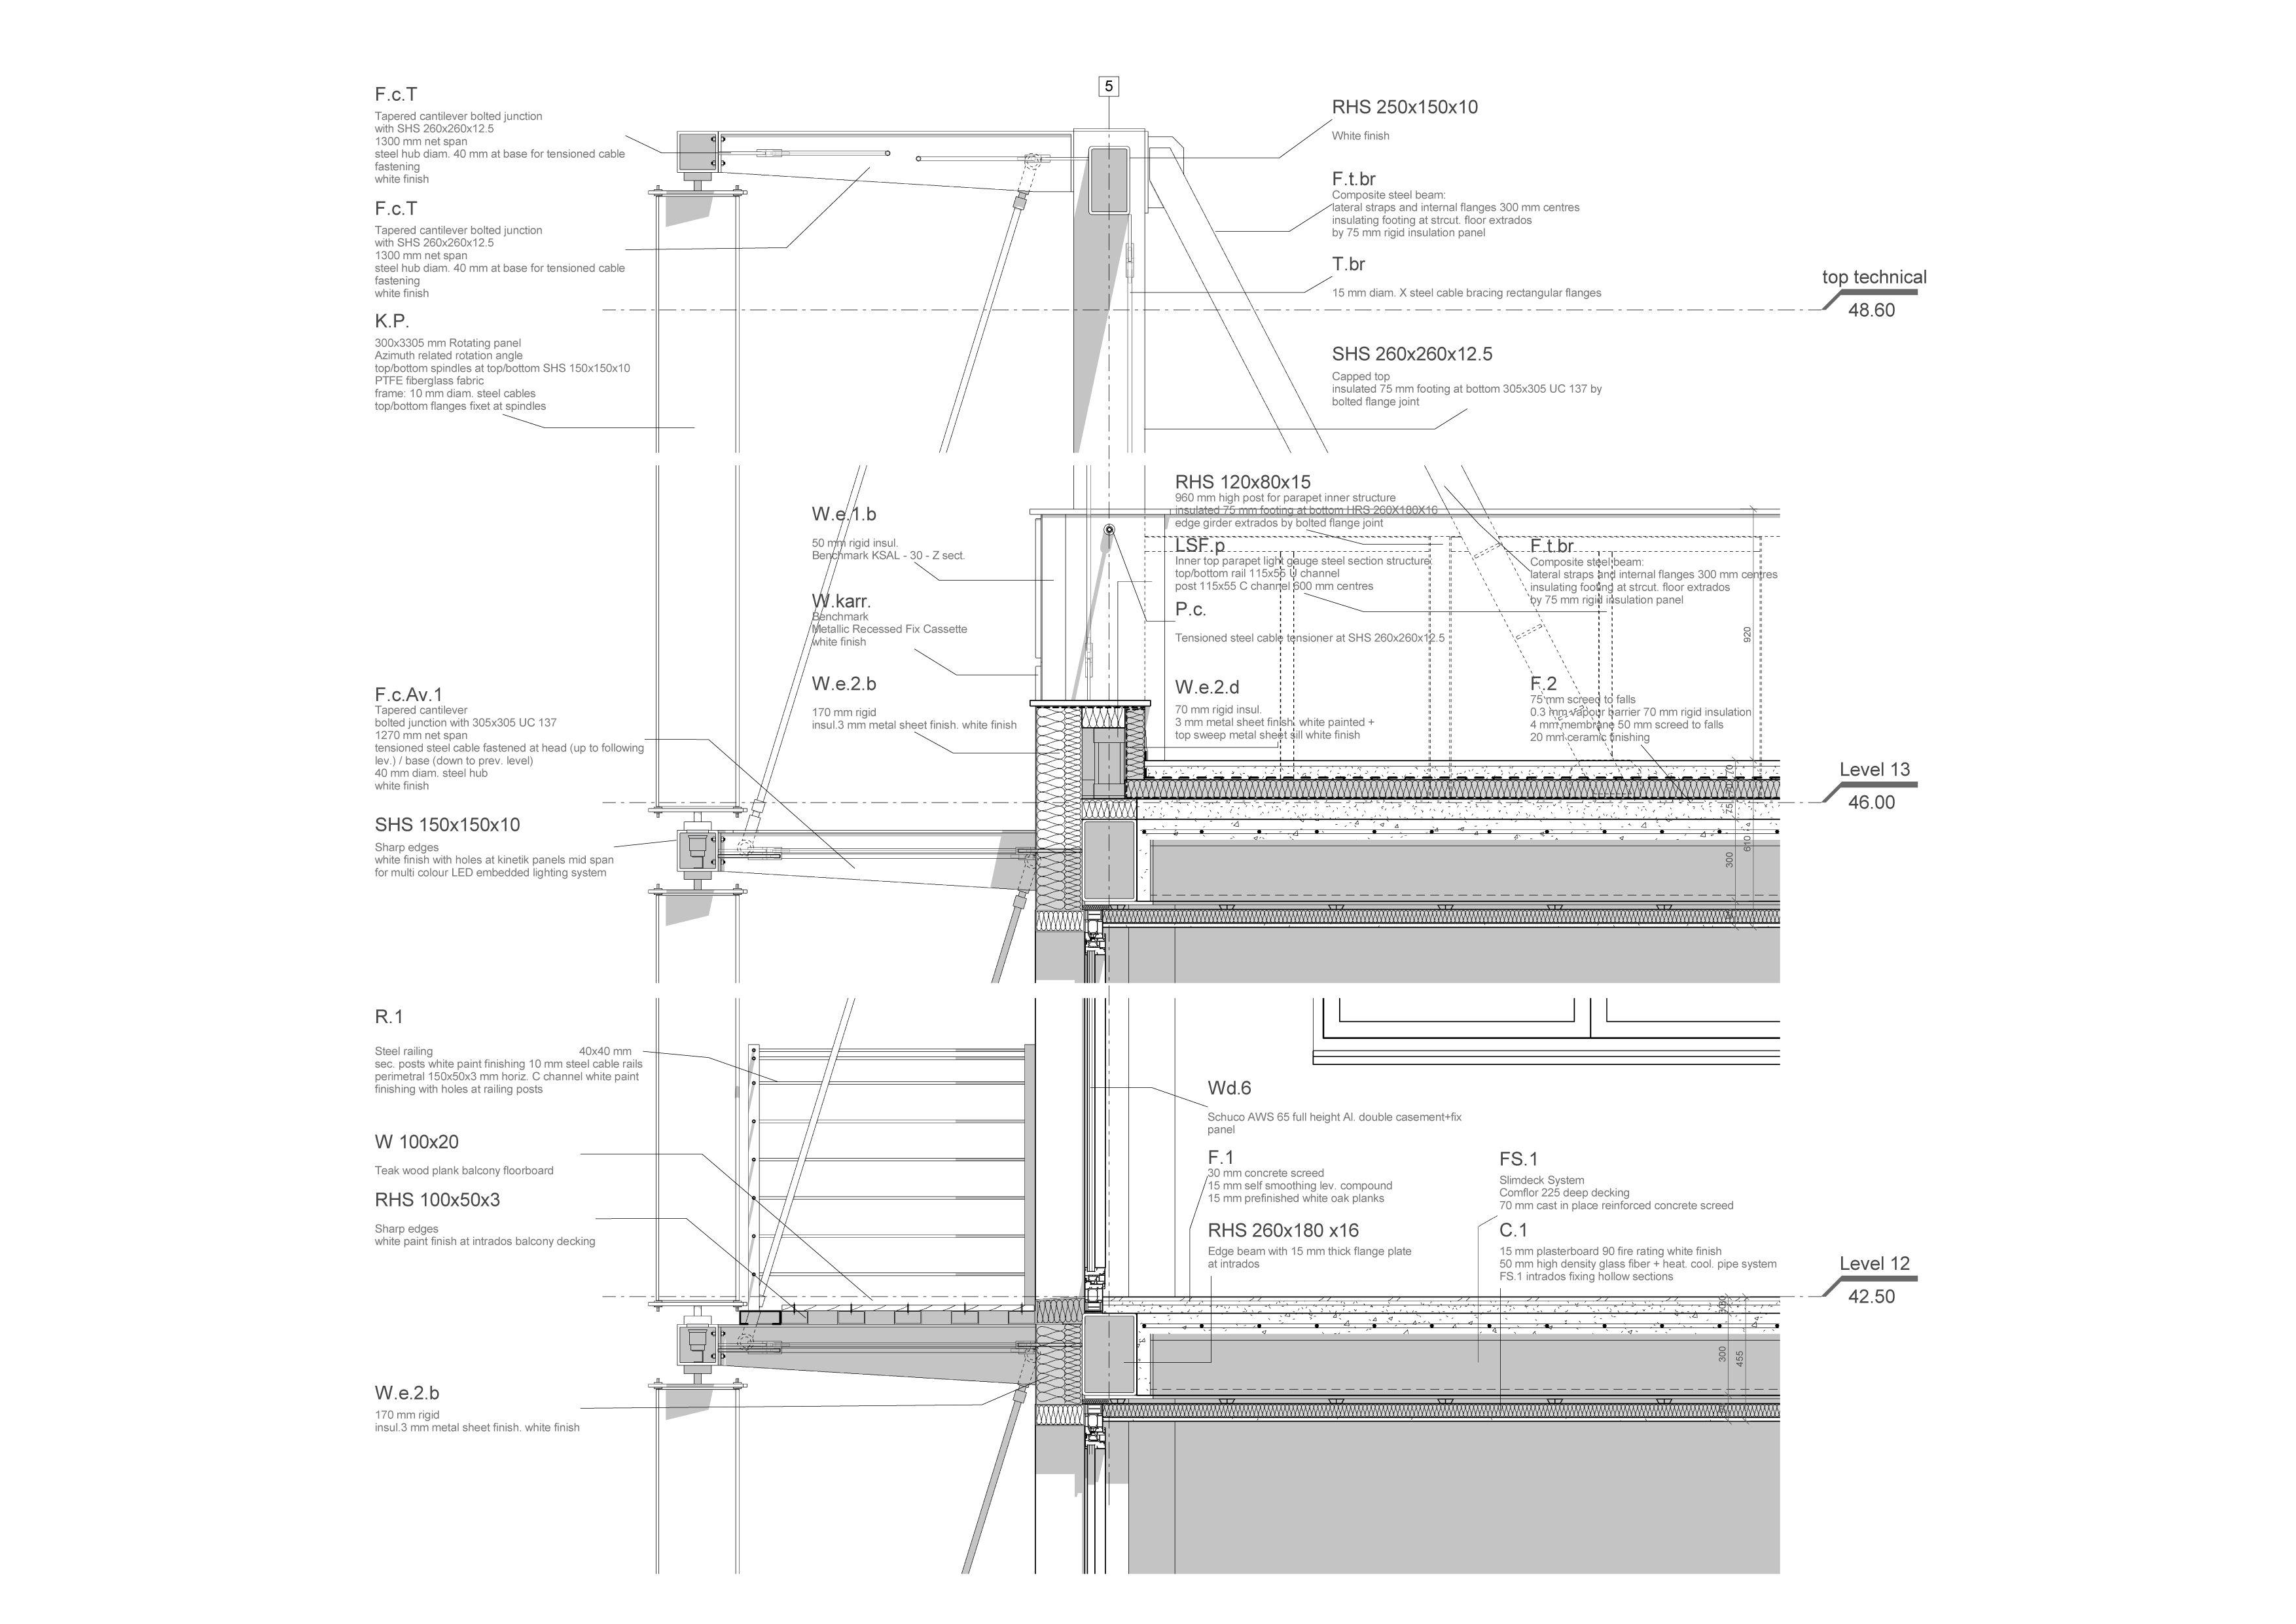 Detail section: rotating PTFE fiberglass fabric panel, embedded led lighting fixtures